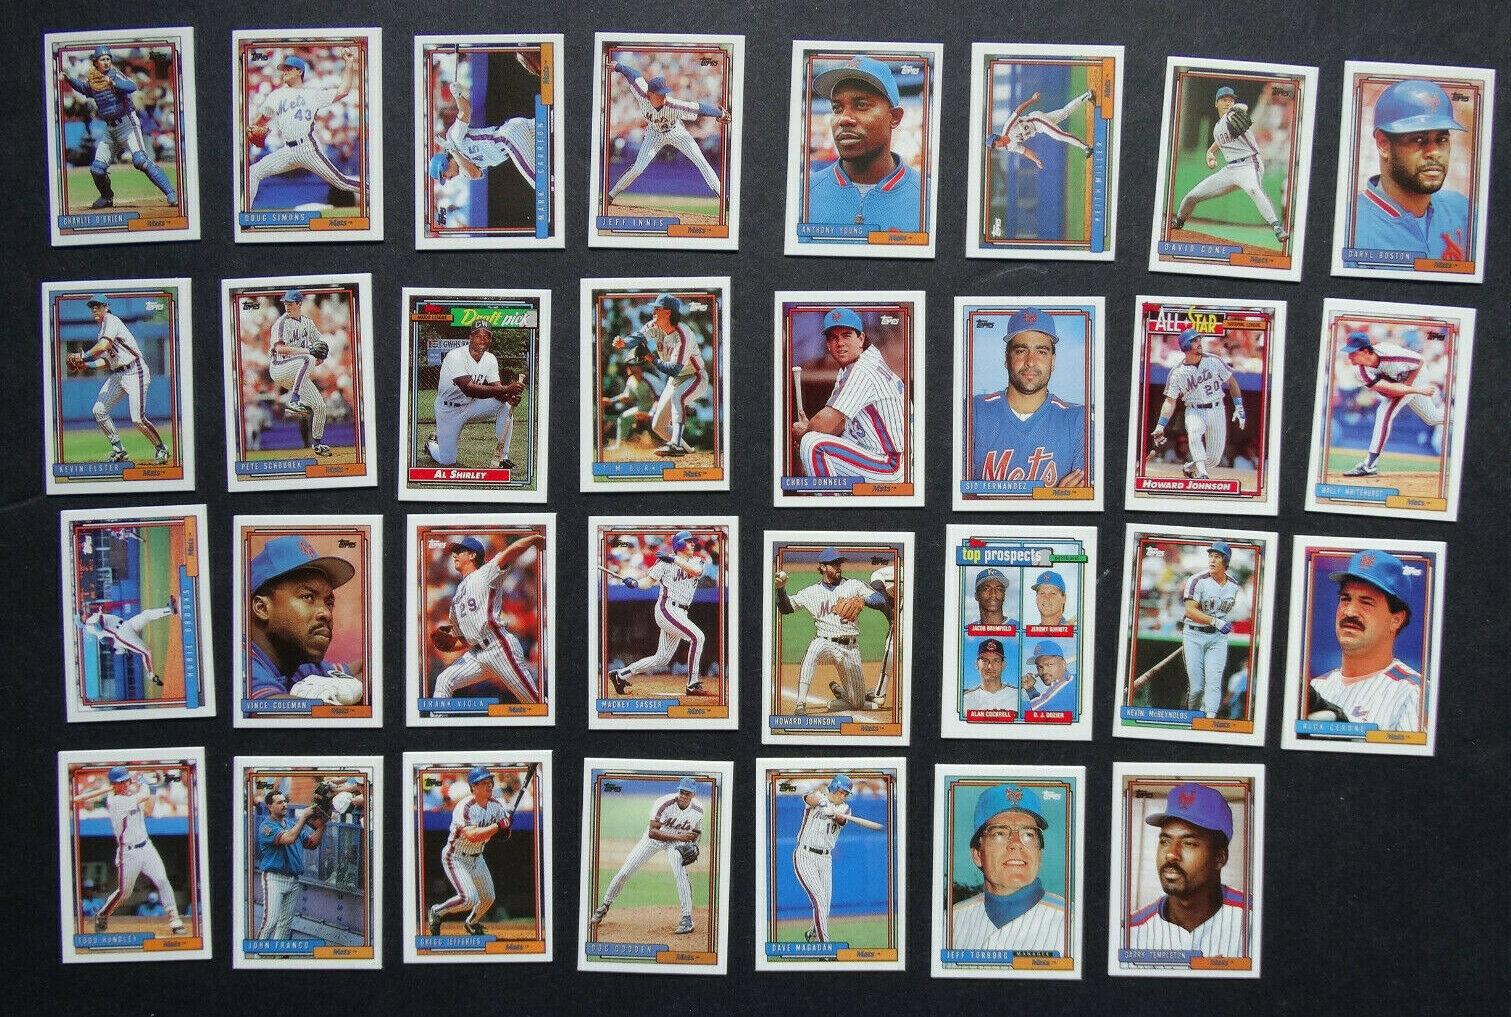 1992 Topps Micro Mini New York Mets Team Set of 31 Baseball Cards